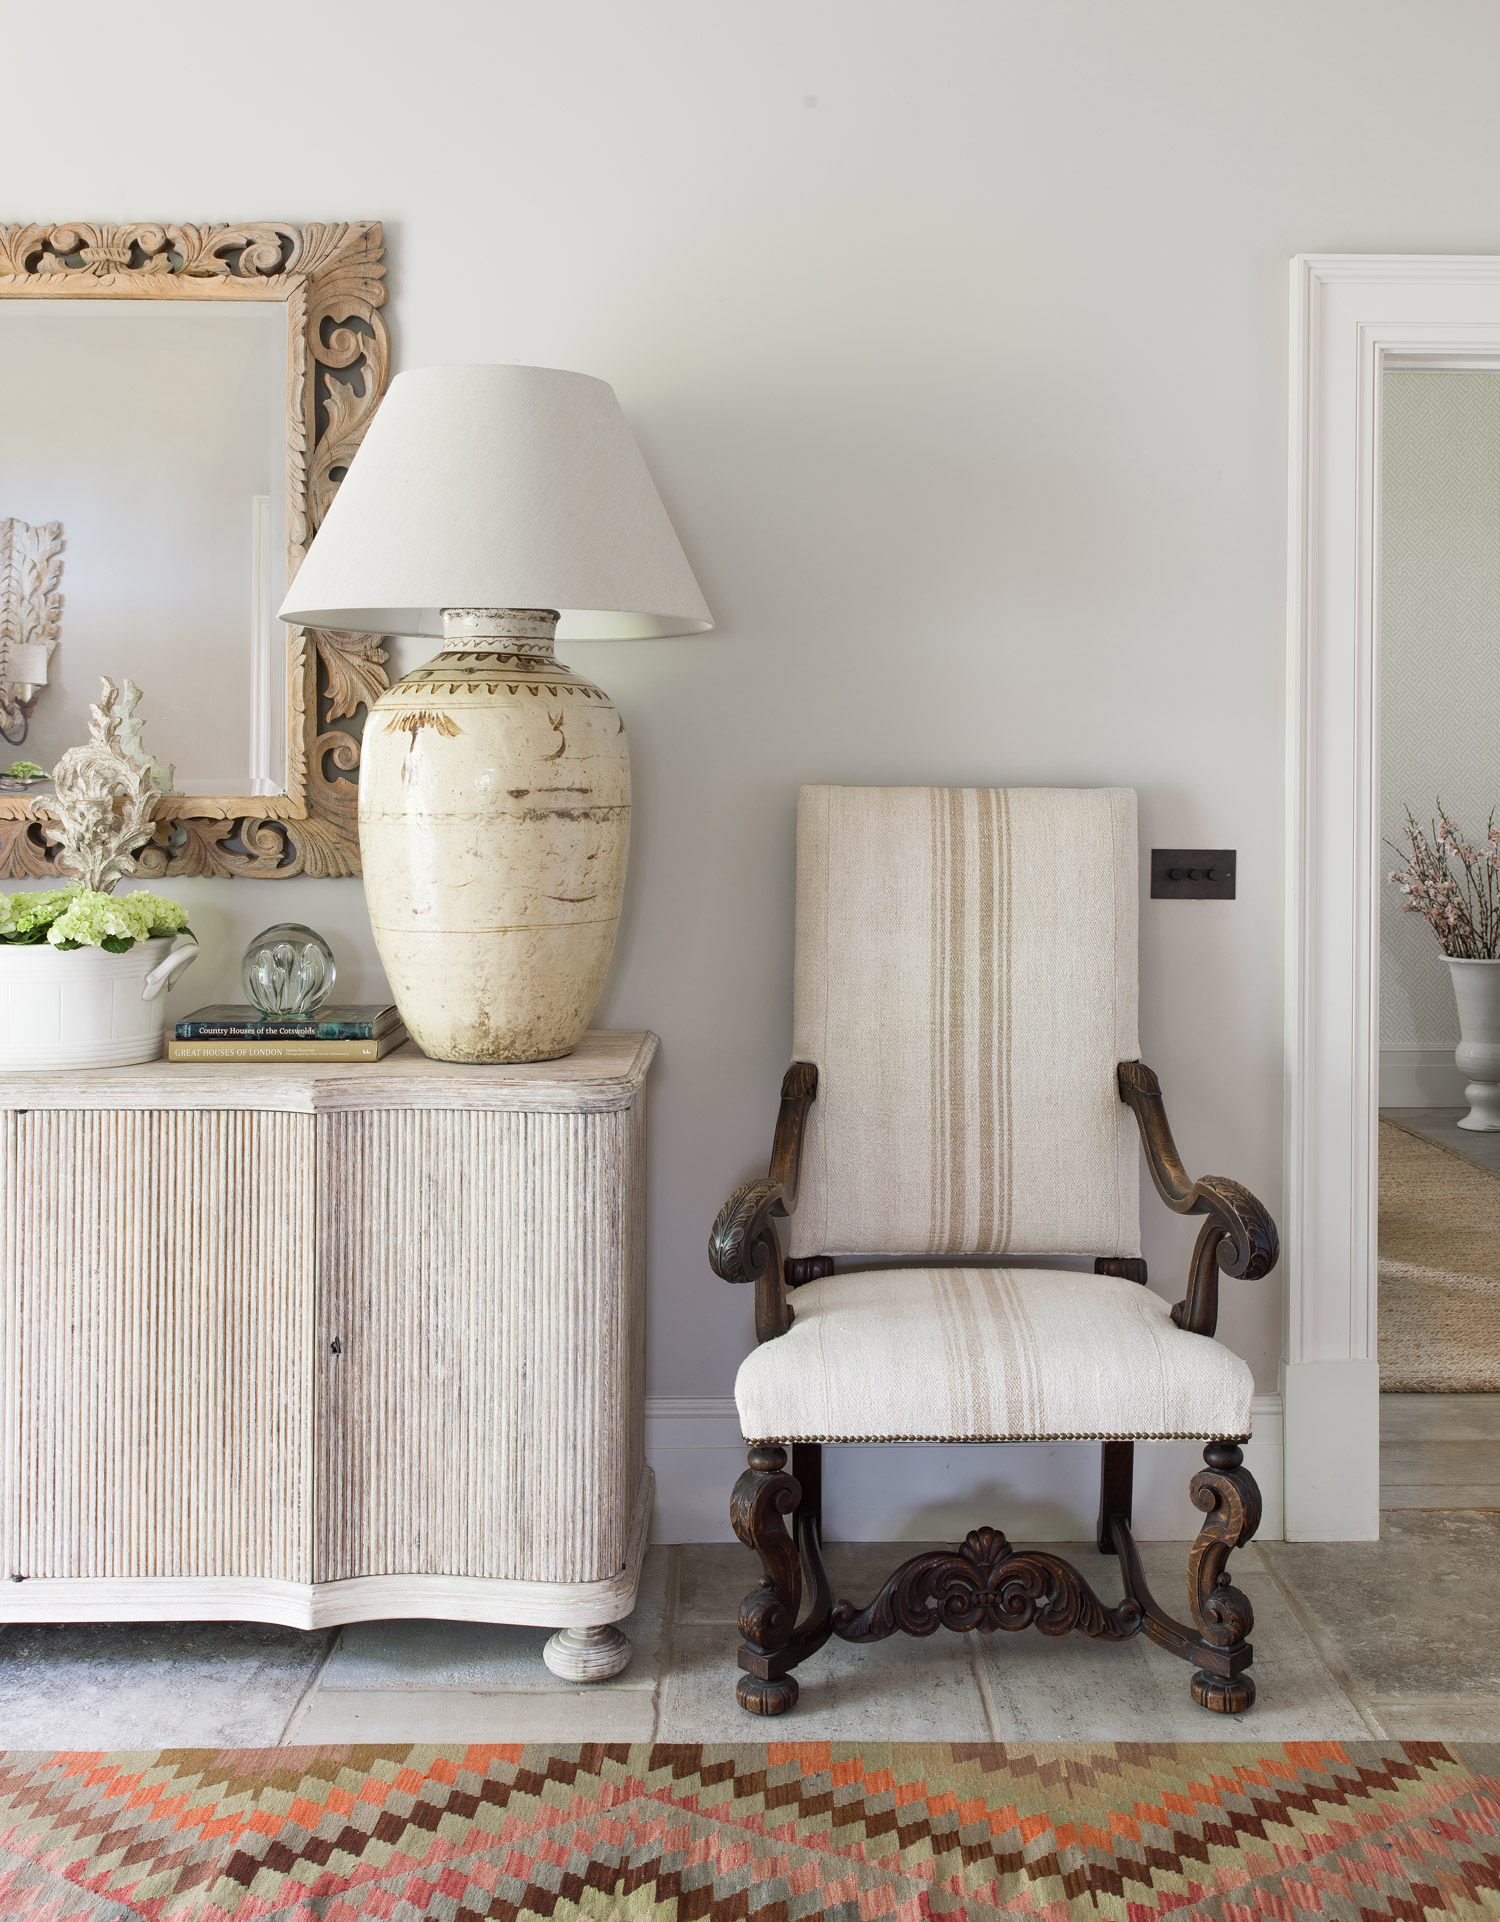 Hall detail – interior design by Eadie & Crole